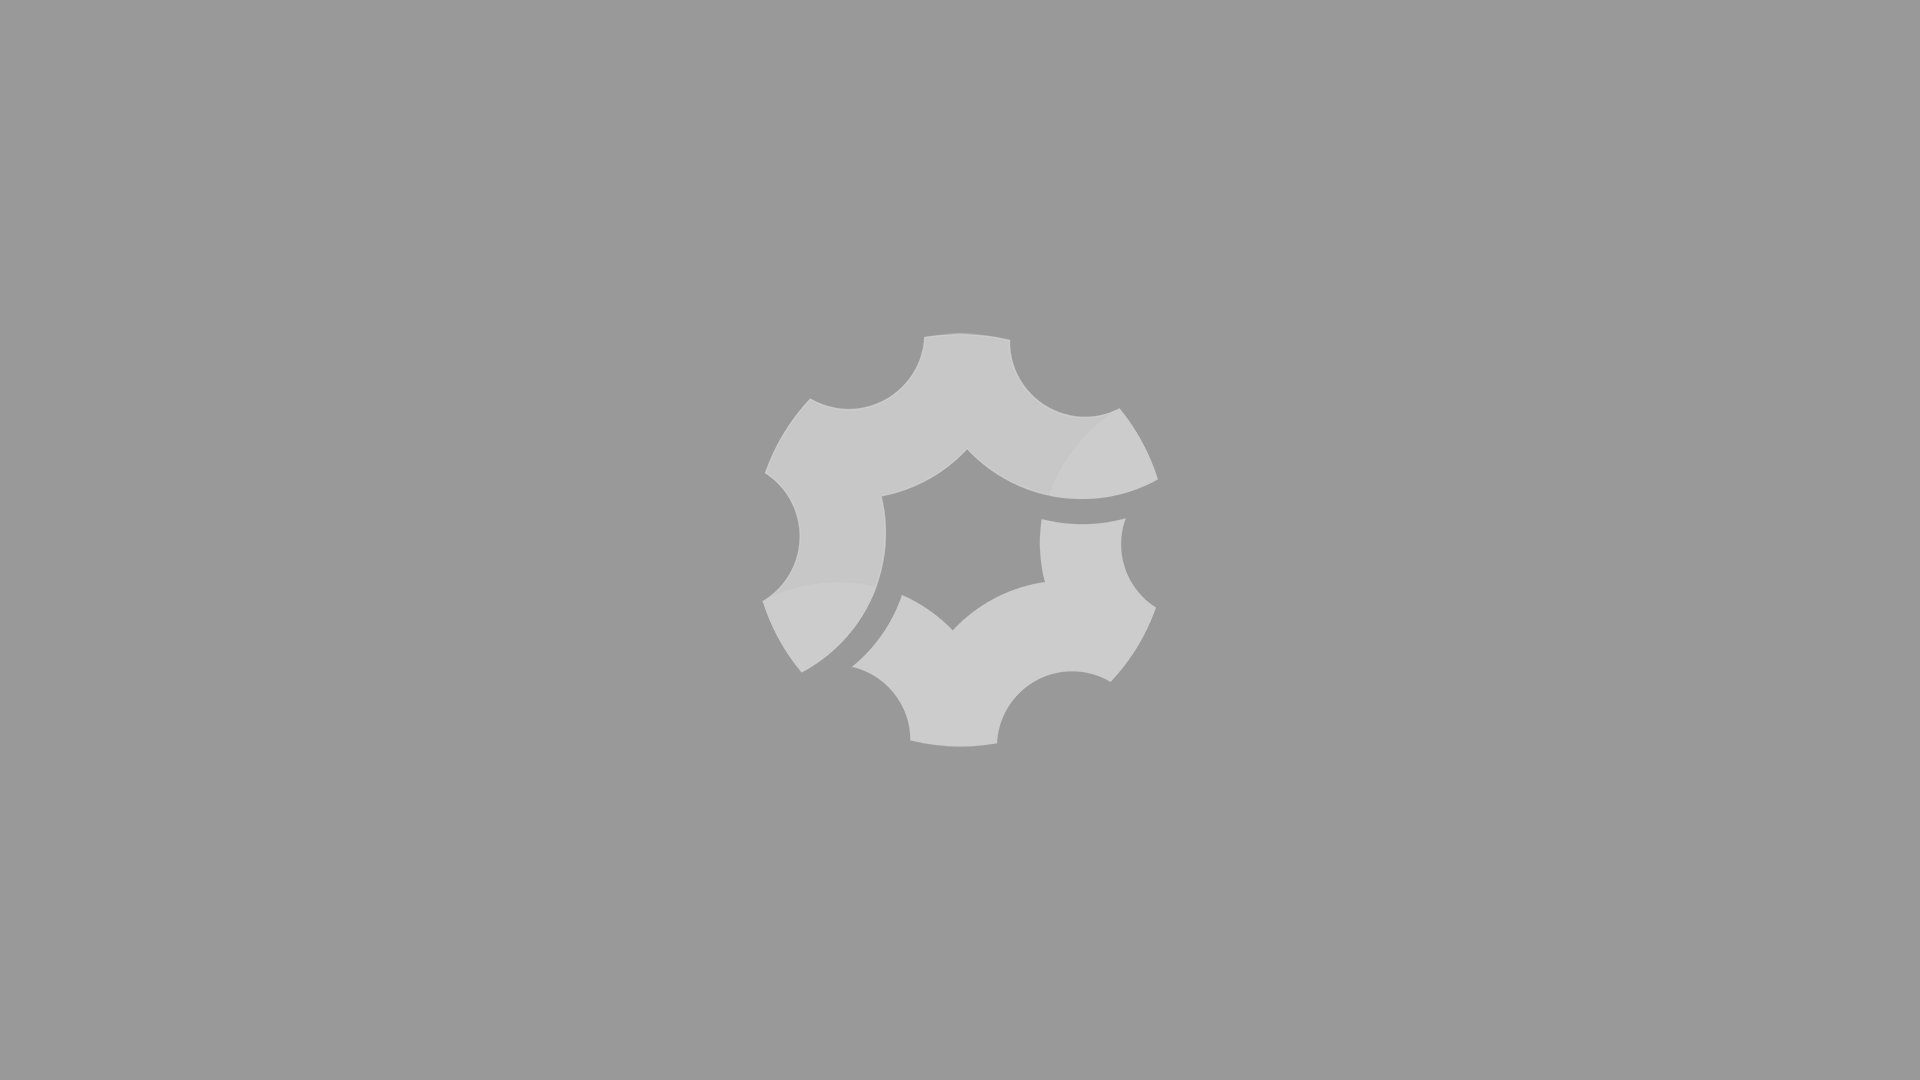 Cross Platform Mod Service for Games - mod io